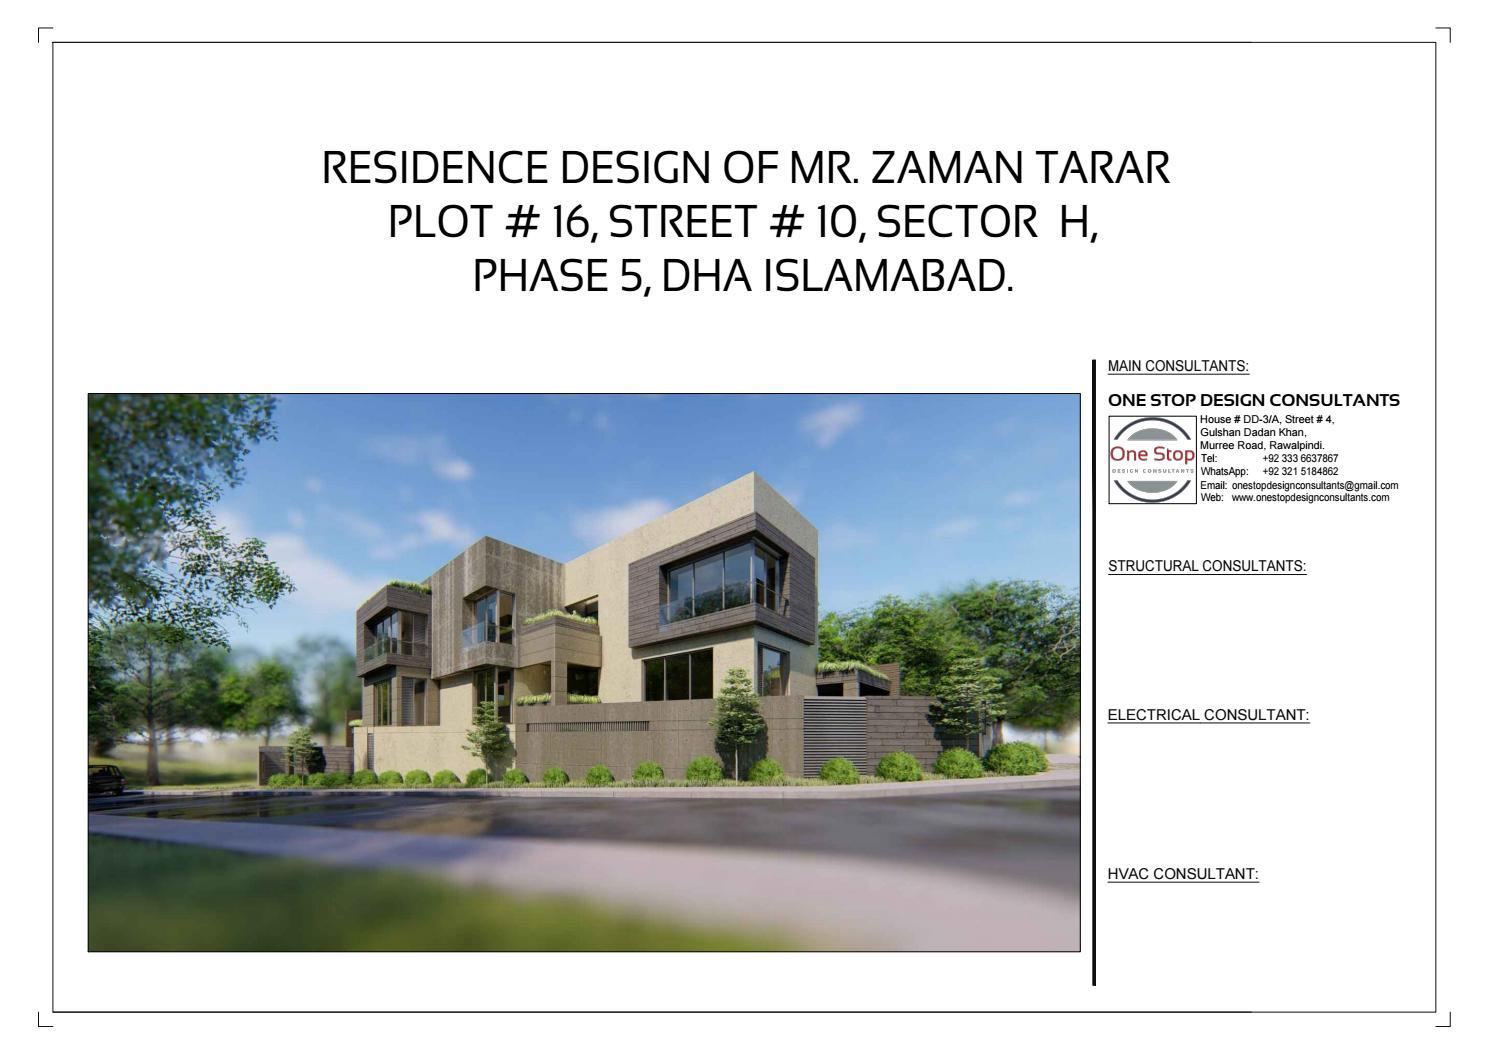 Mr zaman tarar house phase 5 dha islamabad by haseeb saeed issuu